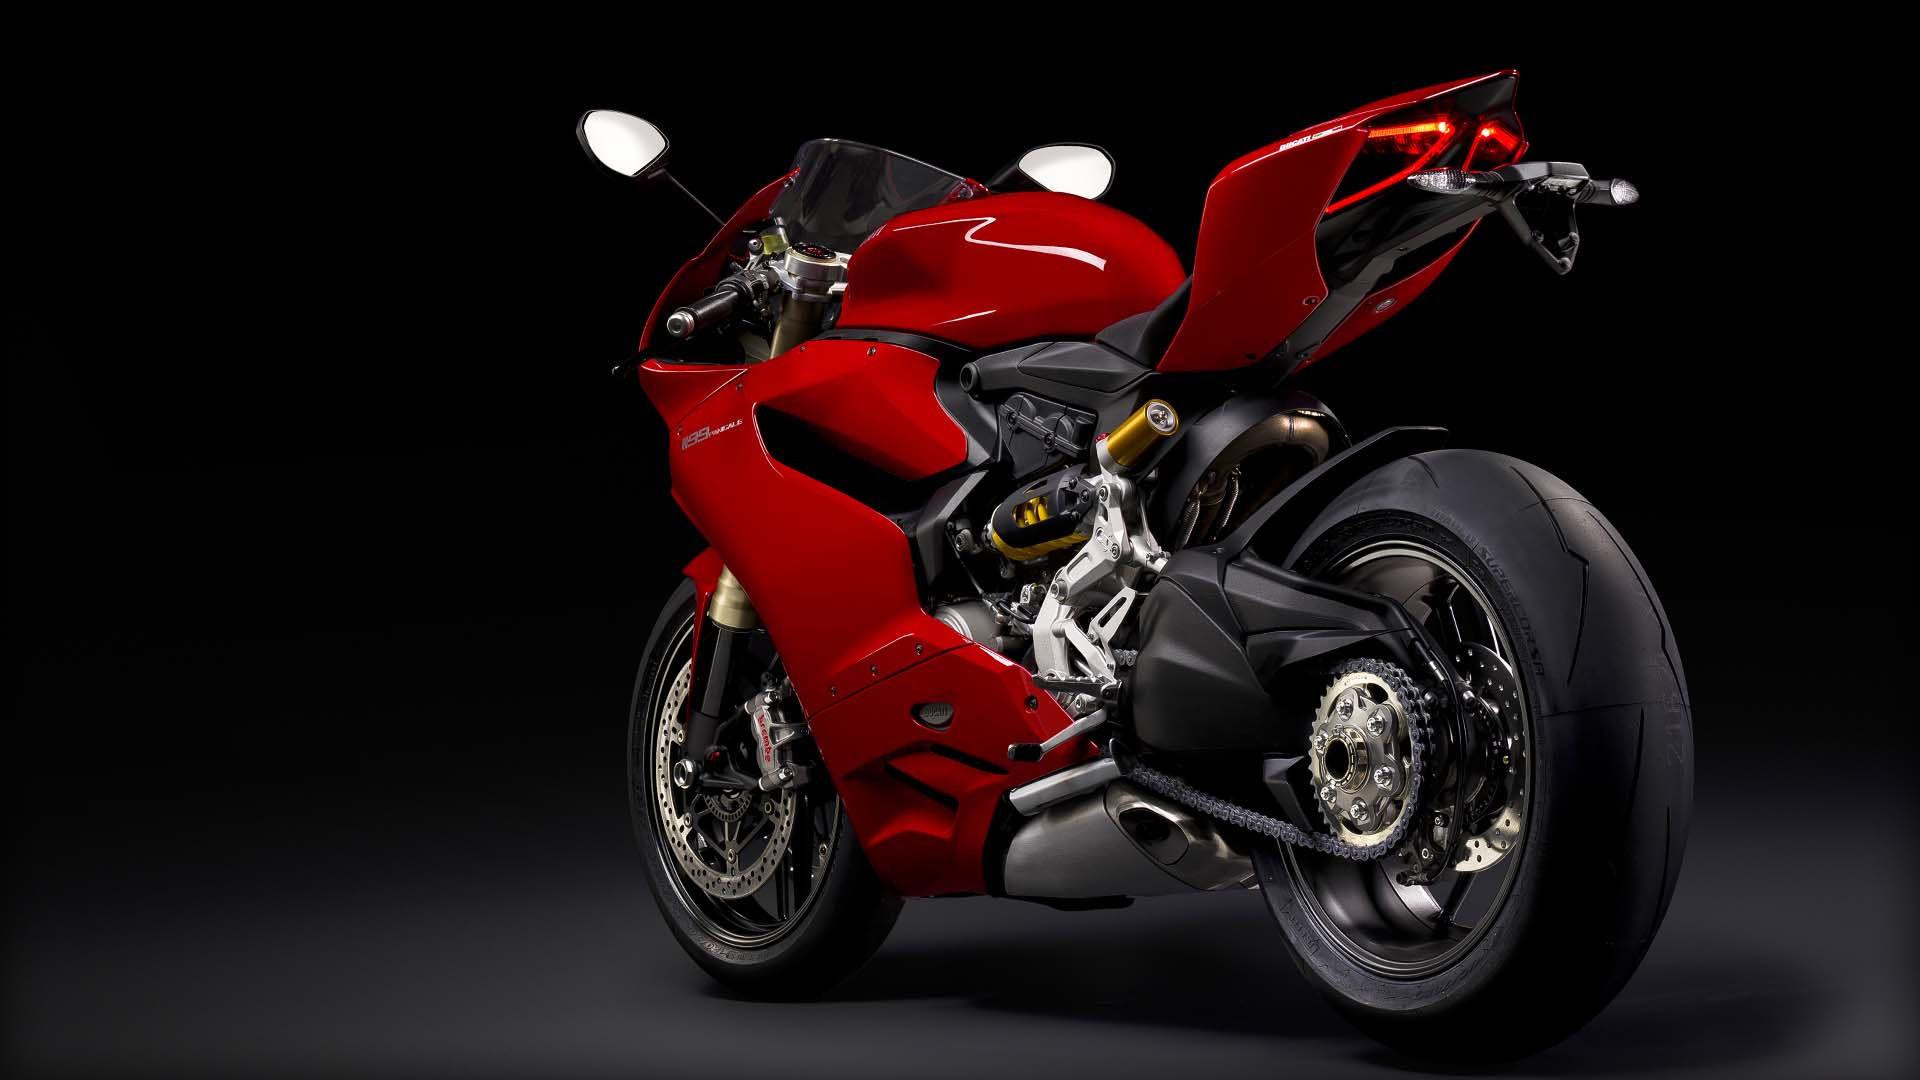 2014 Ducati 1199 PANIGALE   Ducati 1199 Panigale - Side Angled Shot